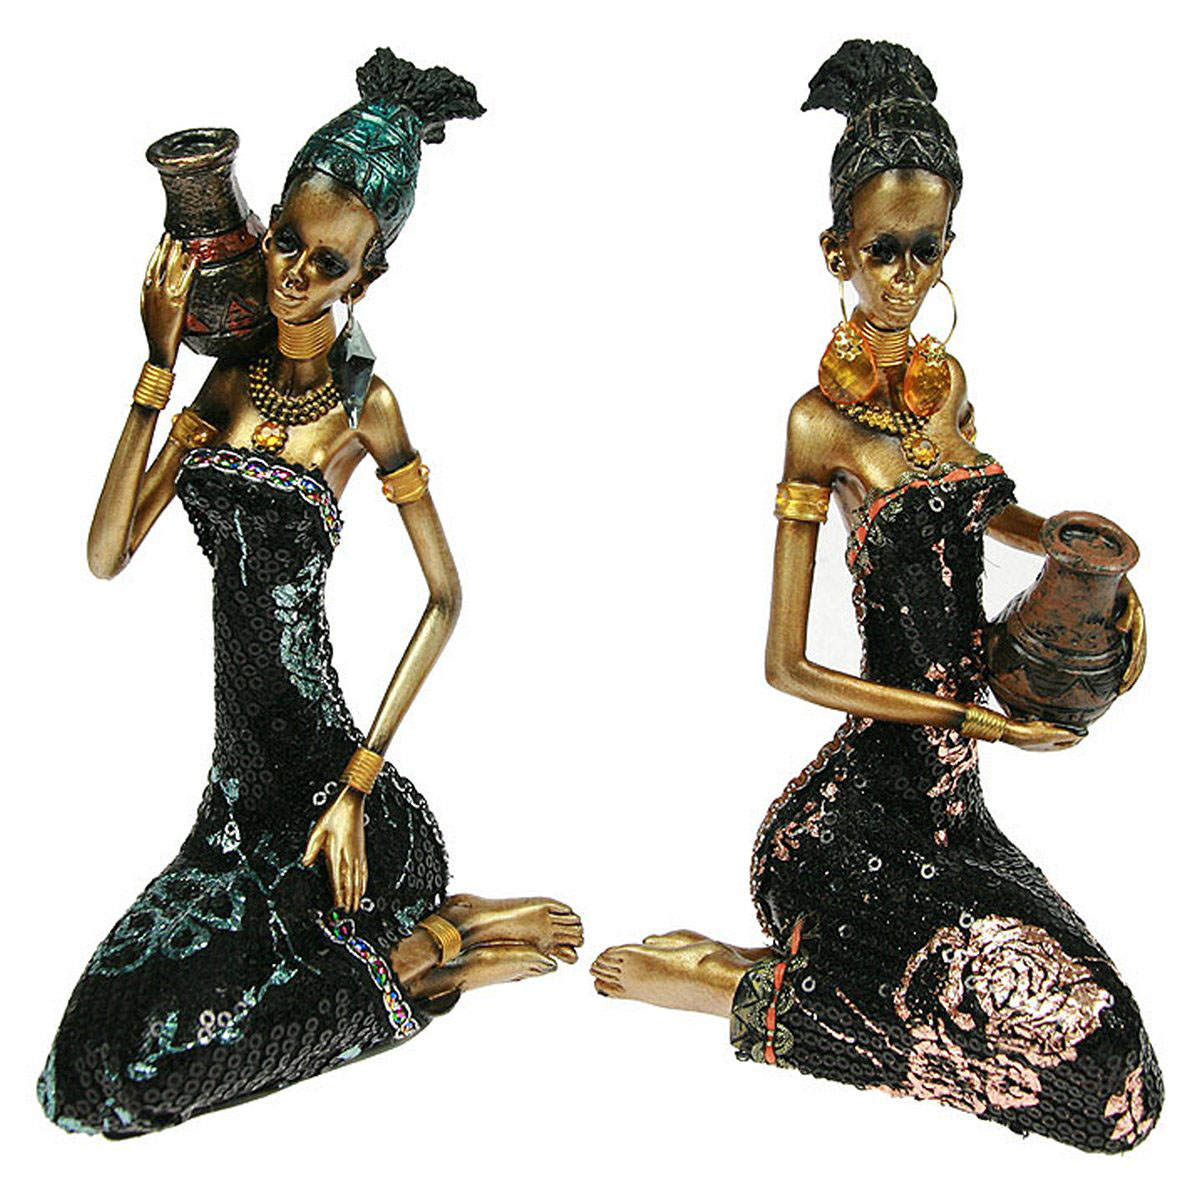 Статуэтка Русские Подарки Африканка, 10 х 11 х 19 см статуэтка lefard африканка 174 311